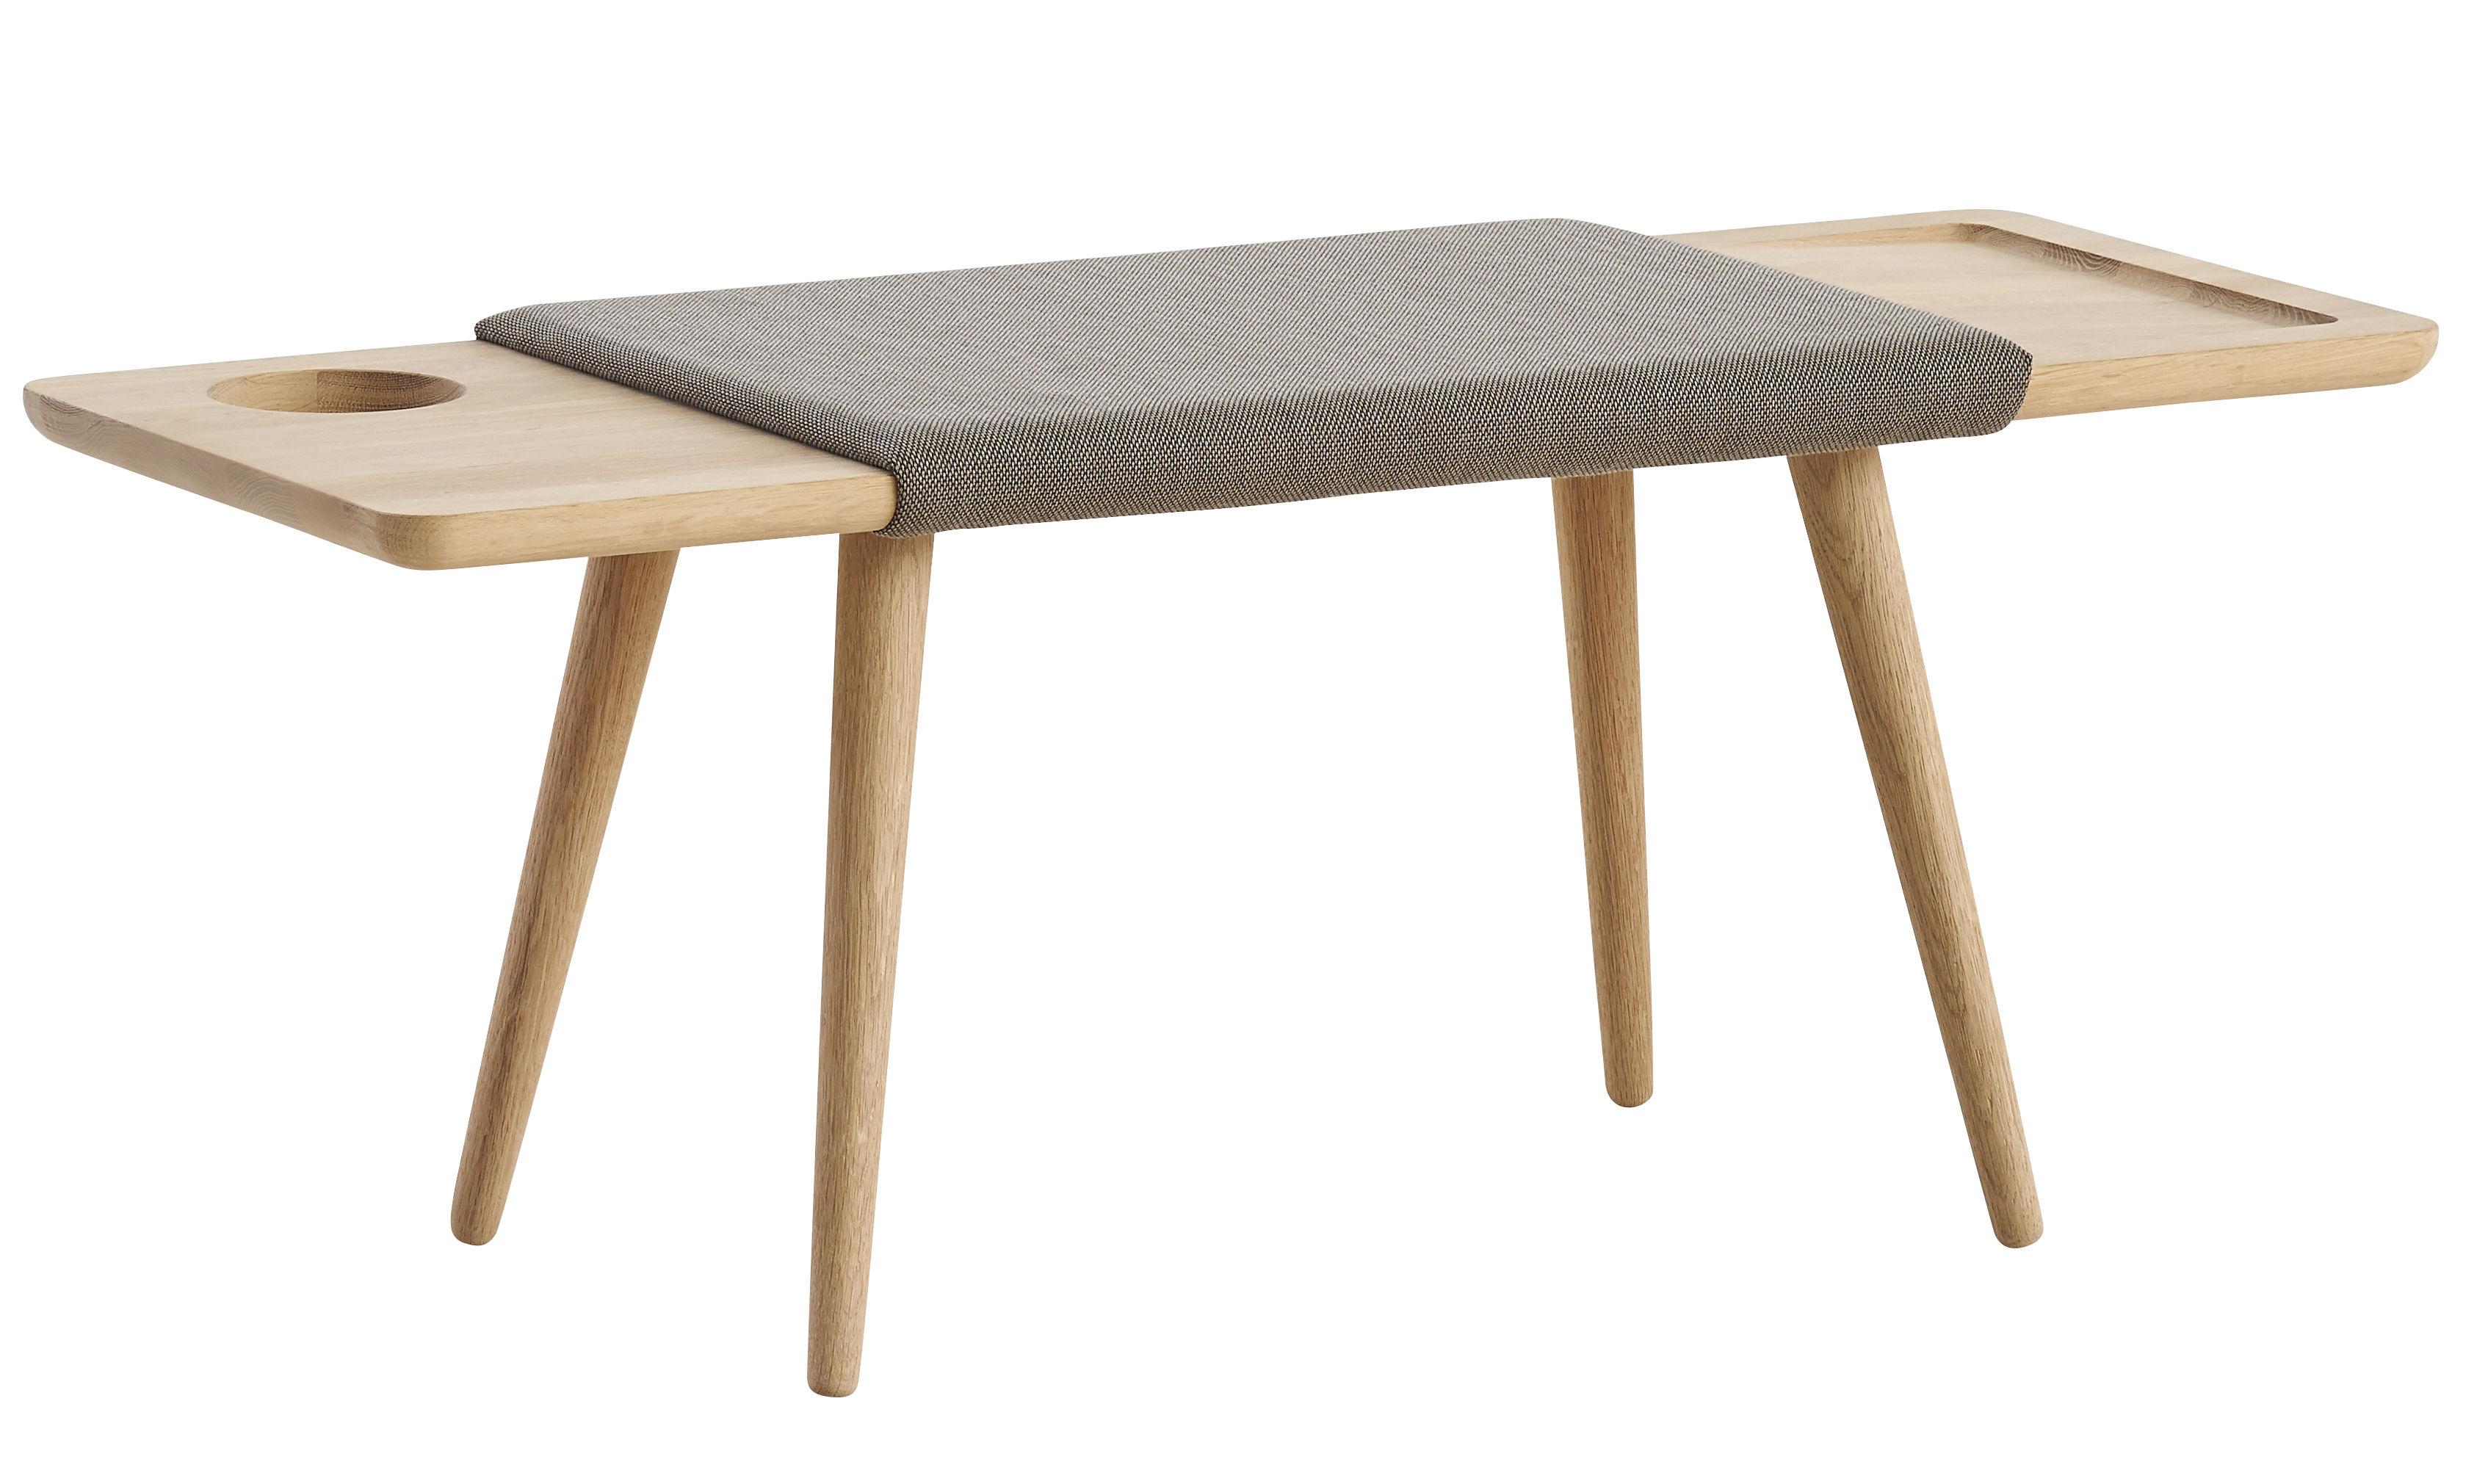 Furniture - Benches - Baenk Bench - L 110 cm / Wood & fabric by Woud - Oak / Beige fabric - Foam, Gabriel fabric, Soap oak